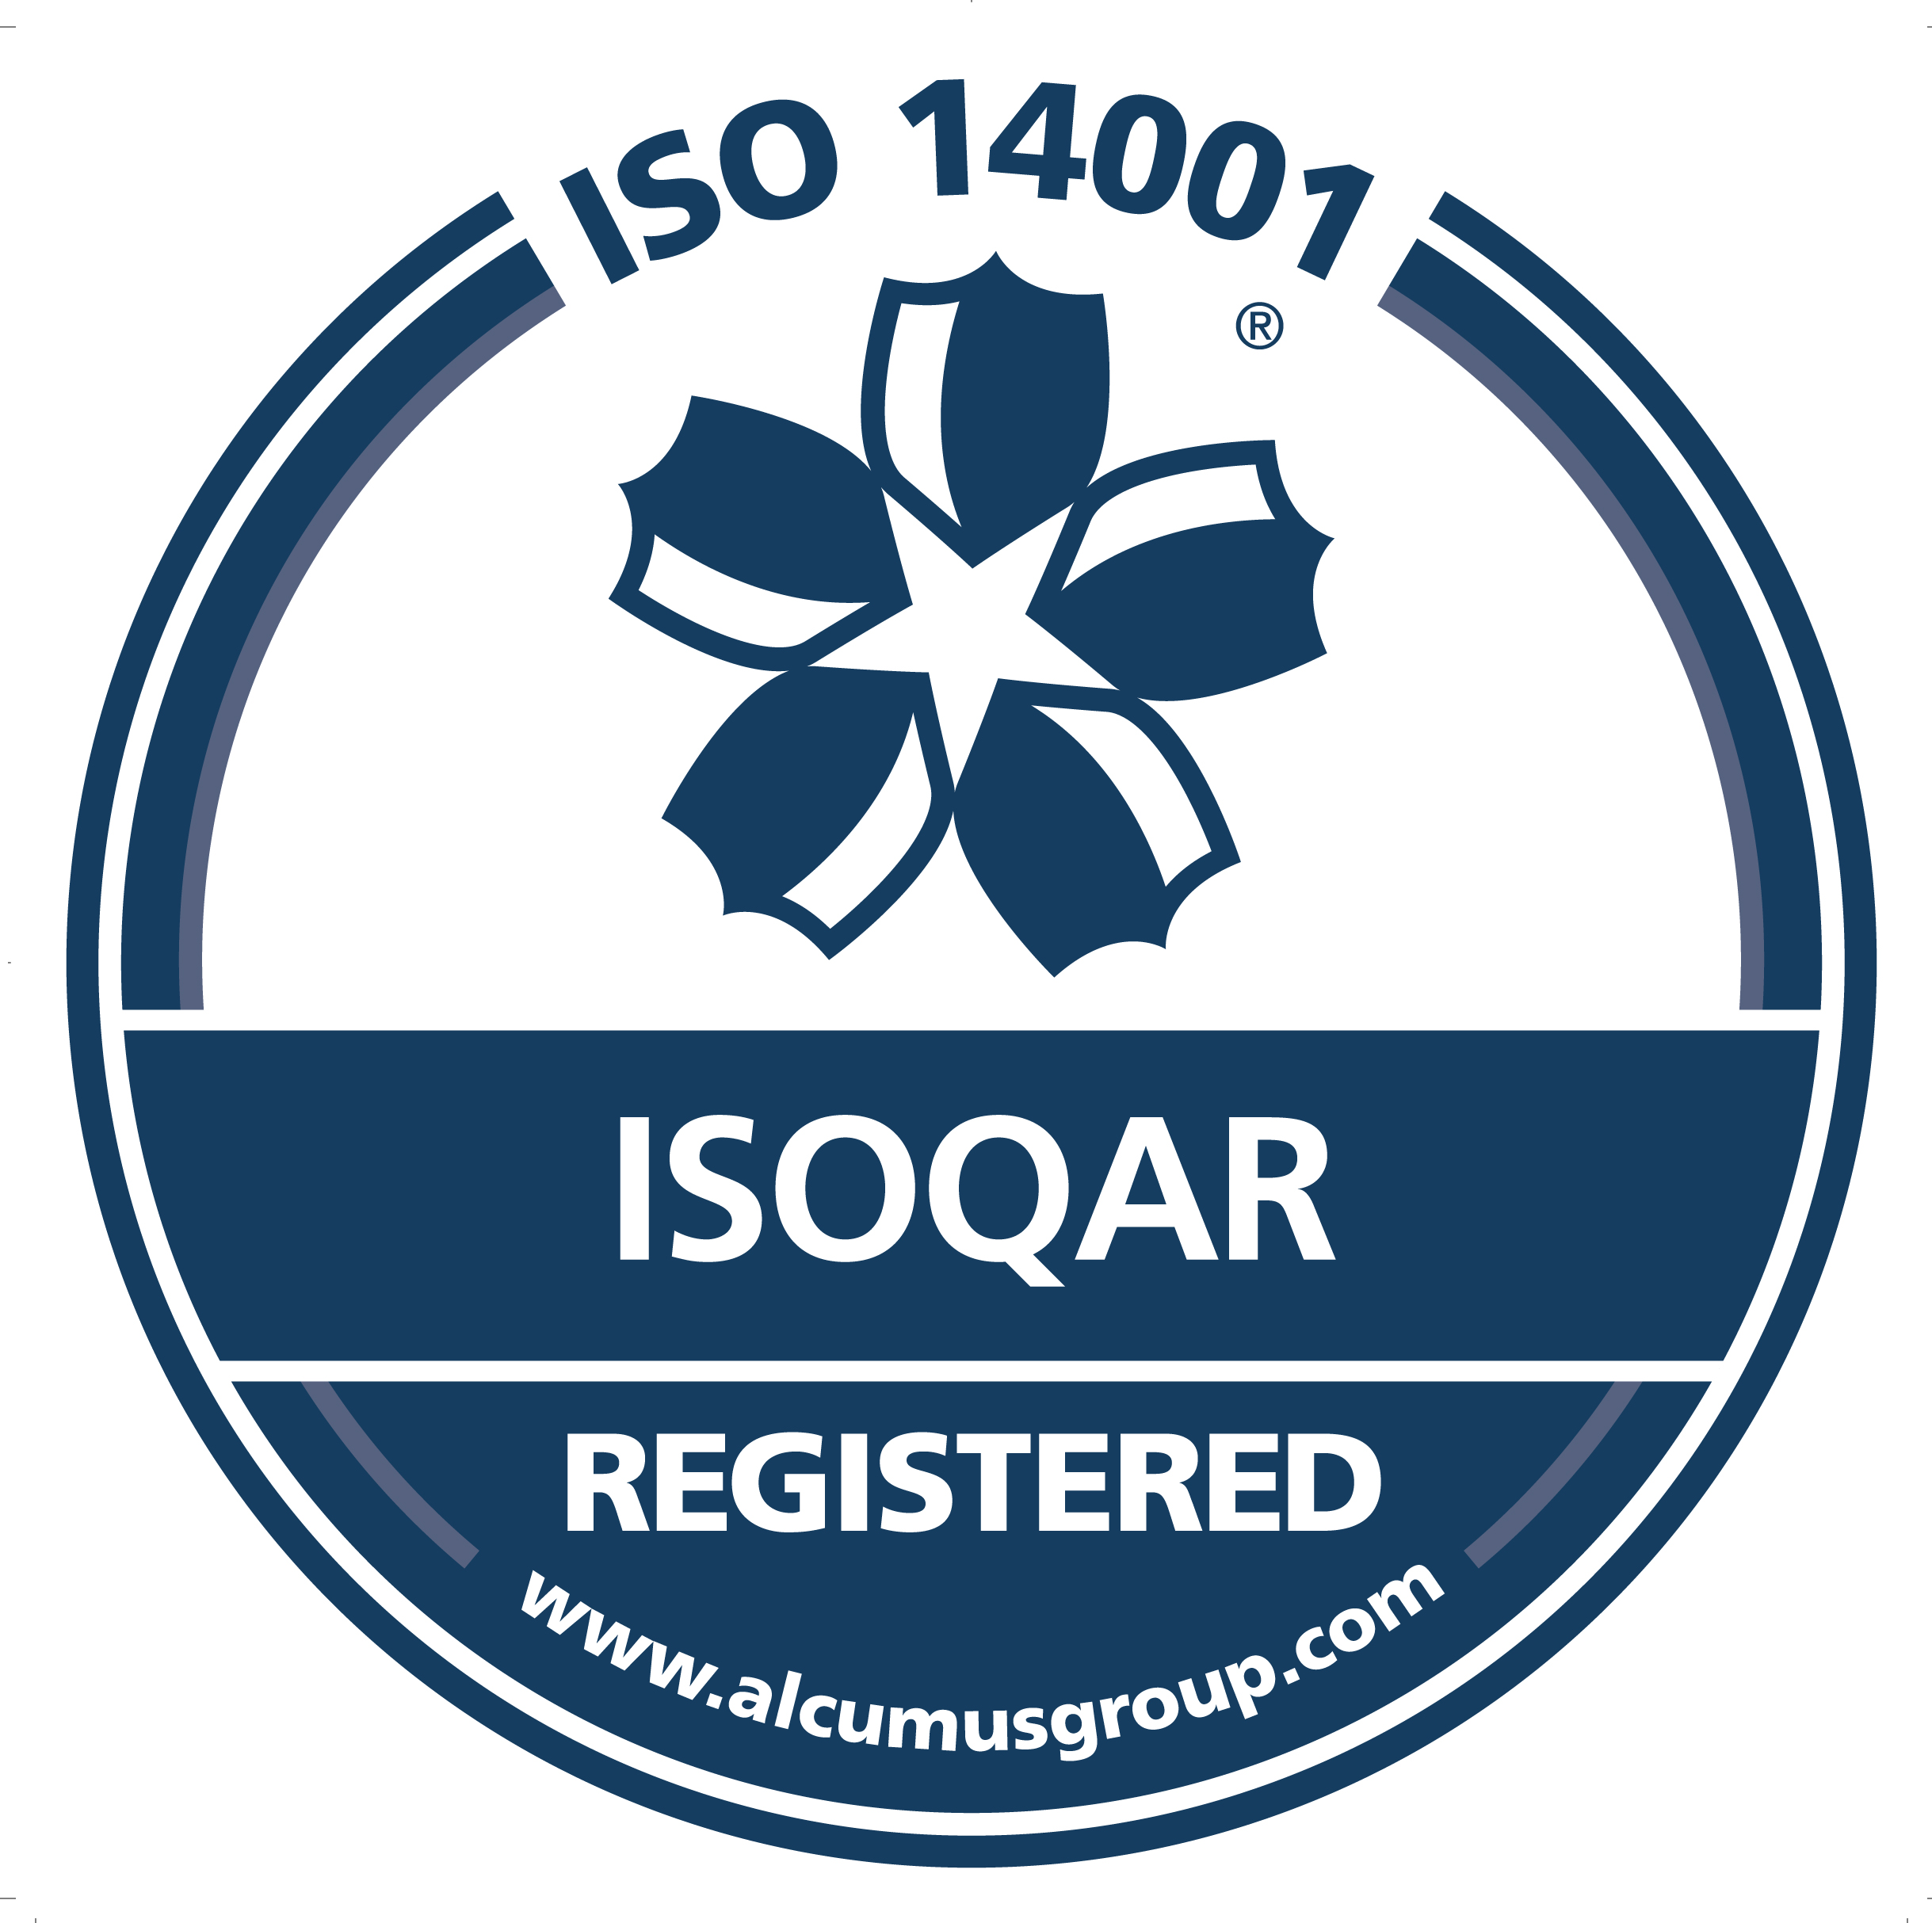 ISOQAR-14001-Accreditation-Sticker